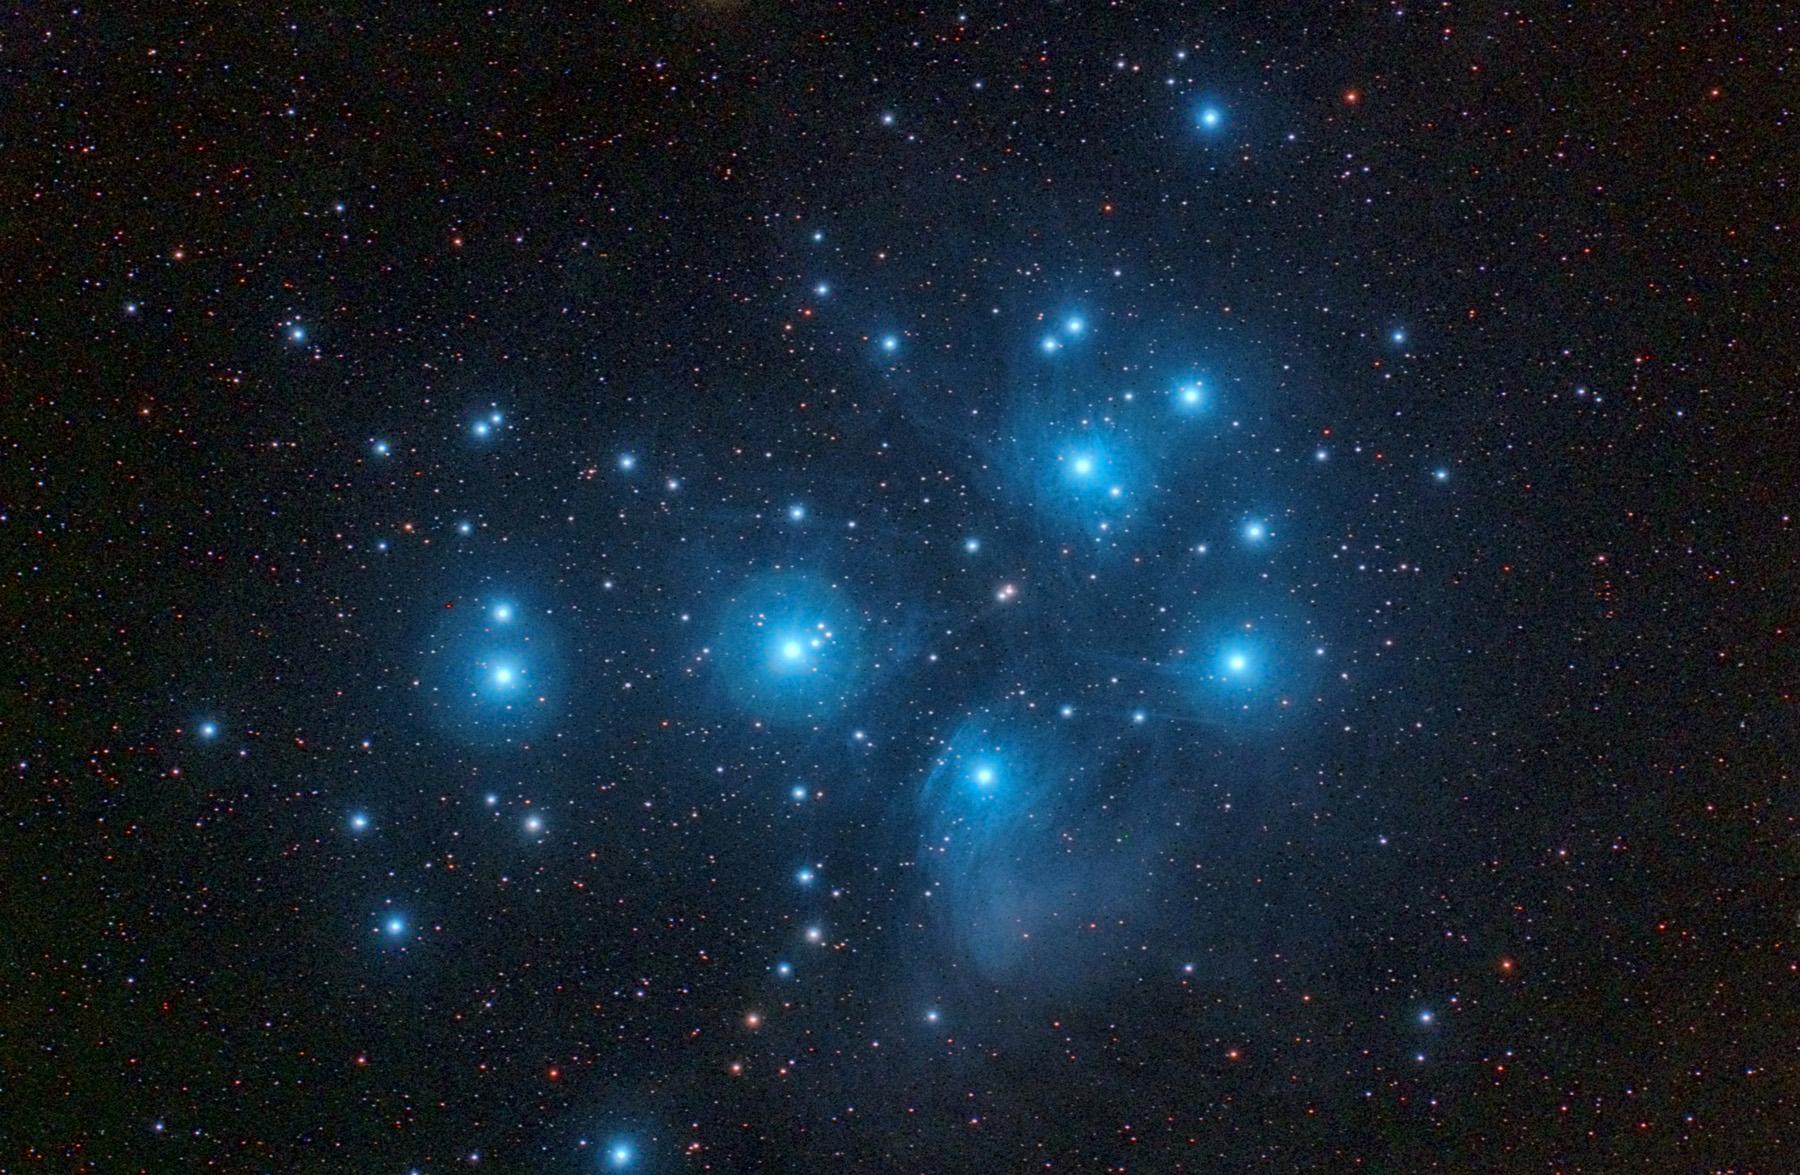 Les plèiades M45